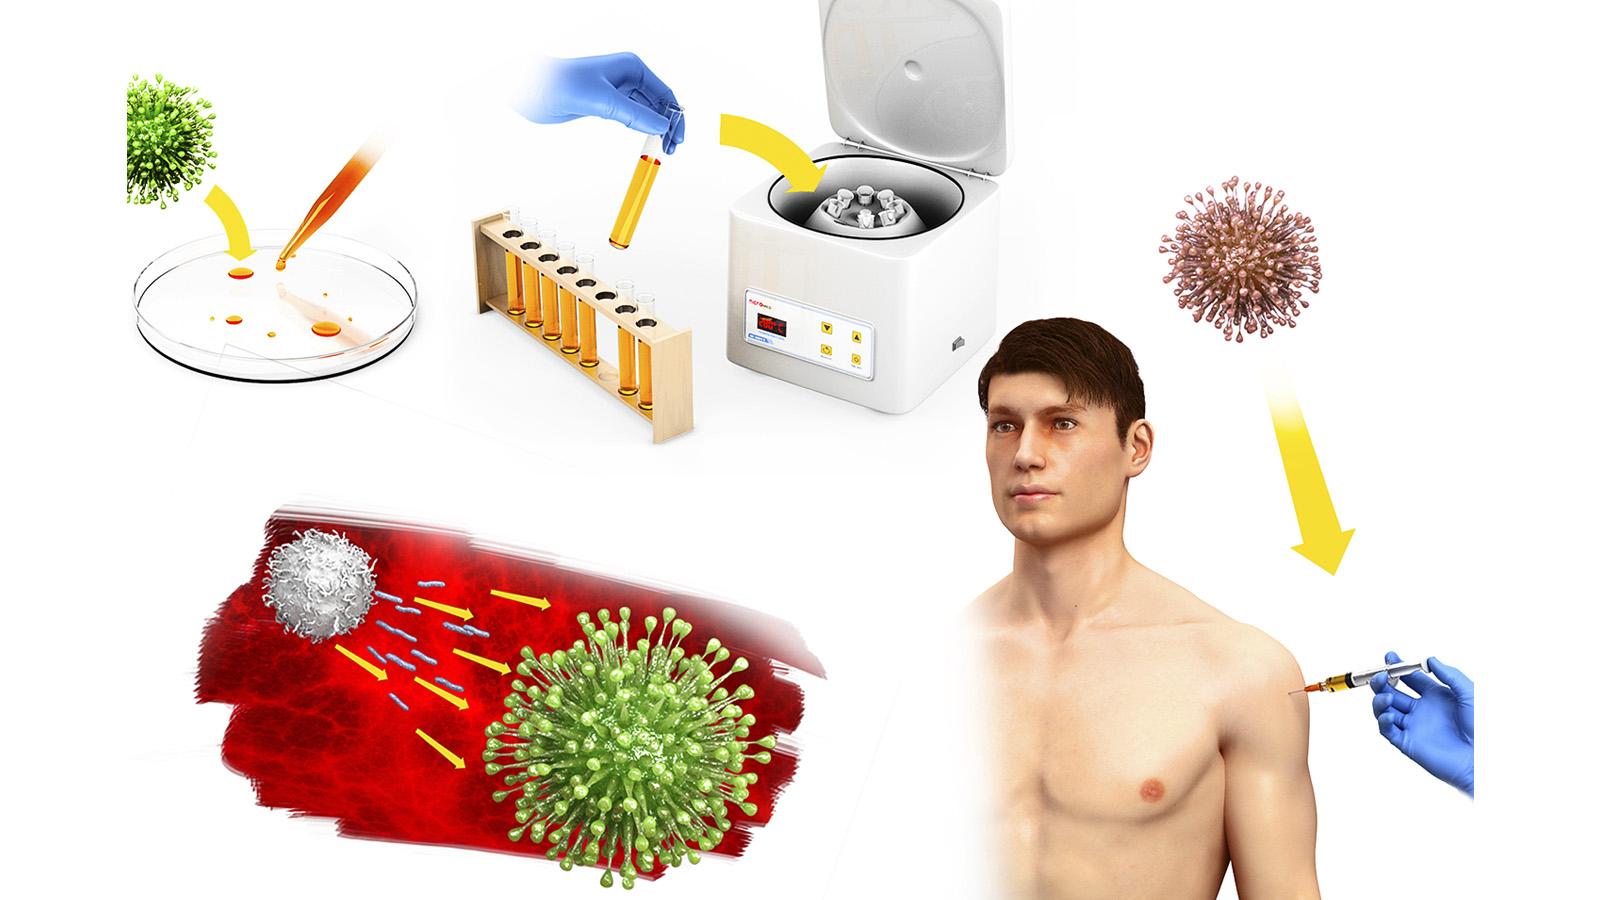 illustration-3D-philippe-raimbault-vaccin-medicaljpg